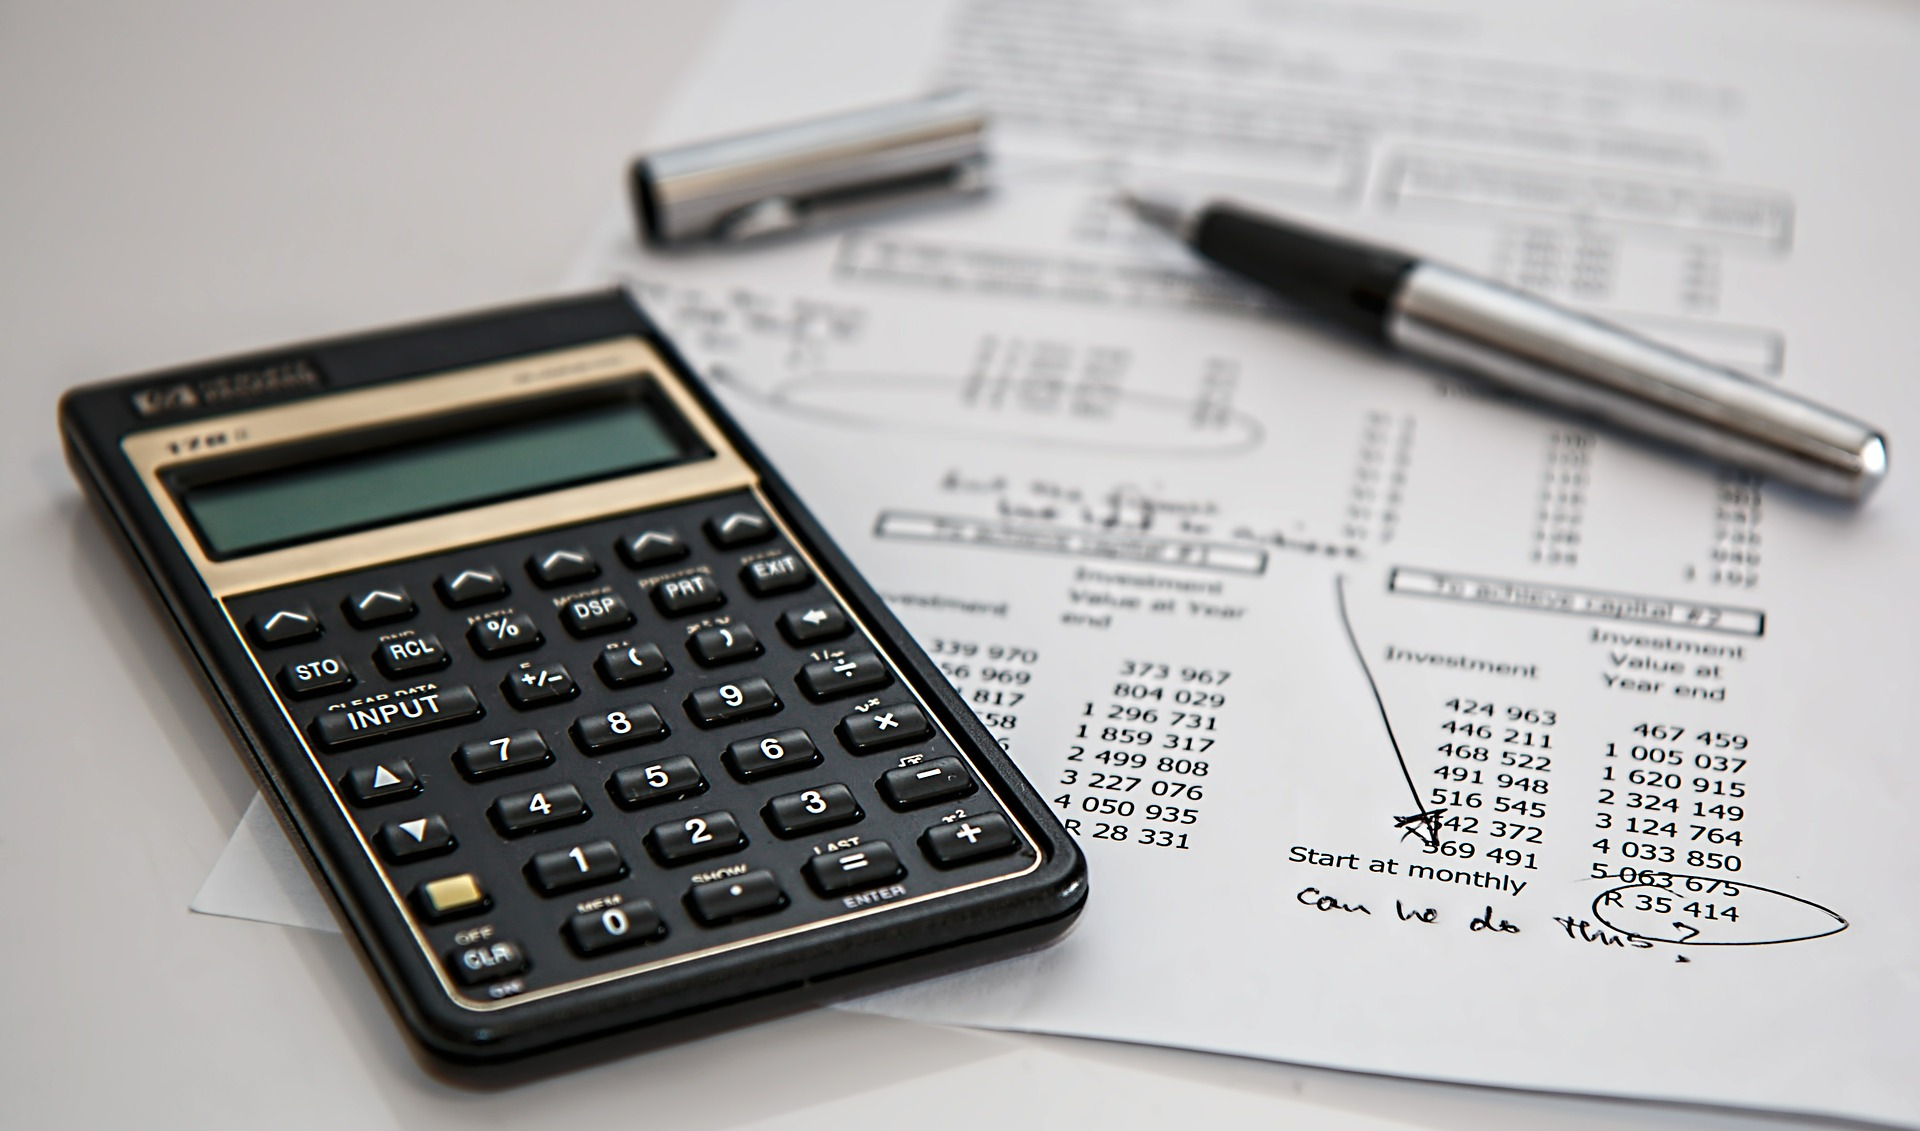 biuro rachunkowe http://millenium.opole.pl/oferta/